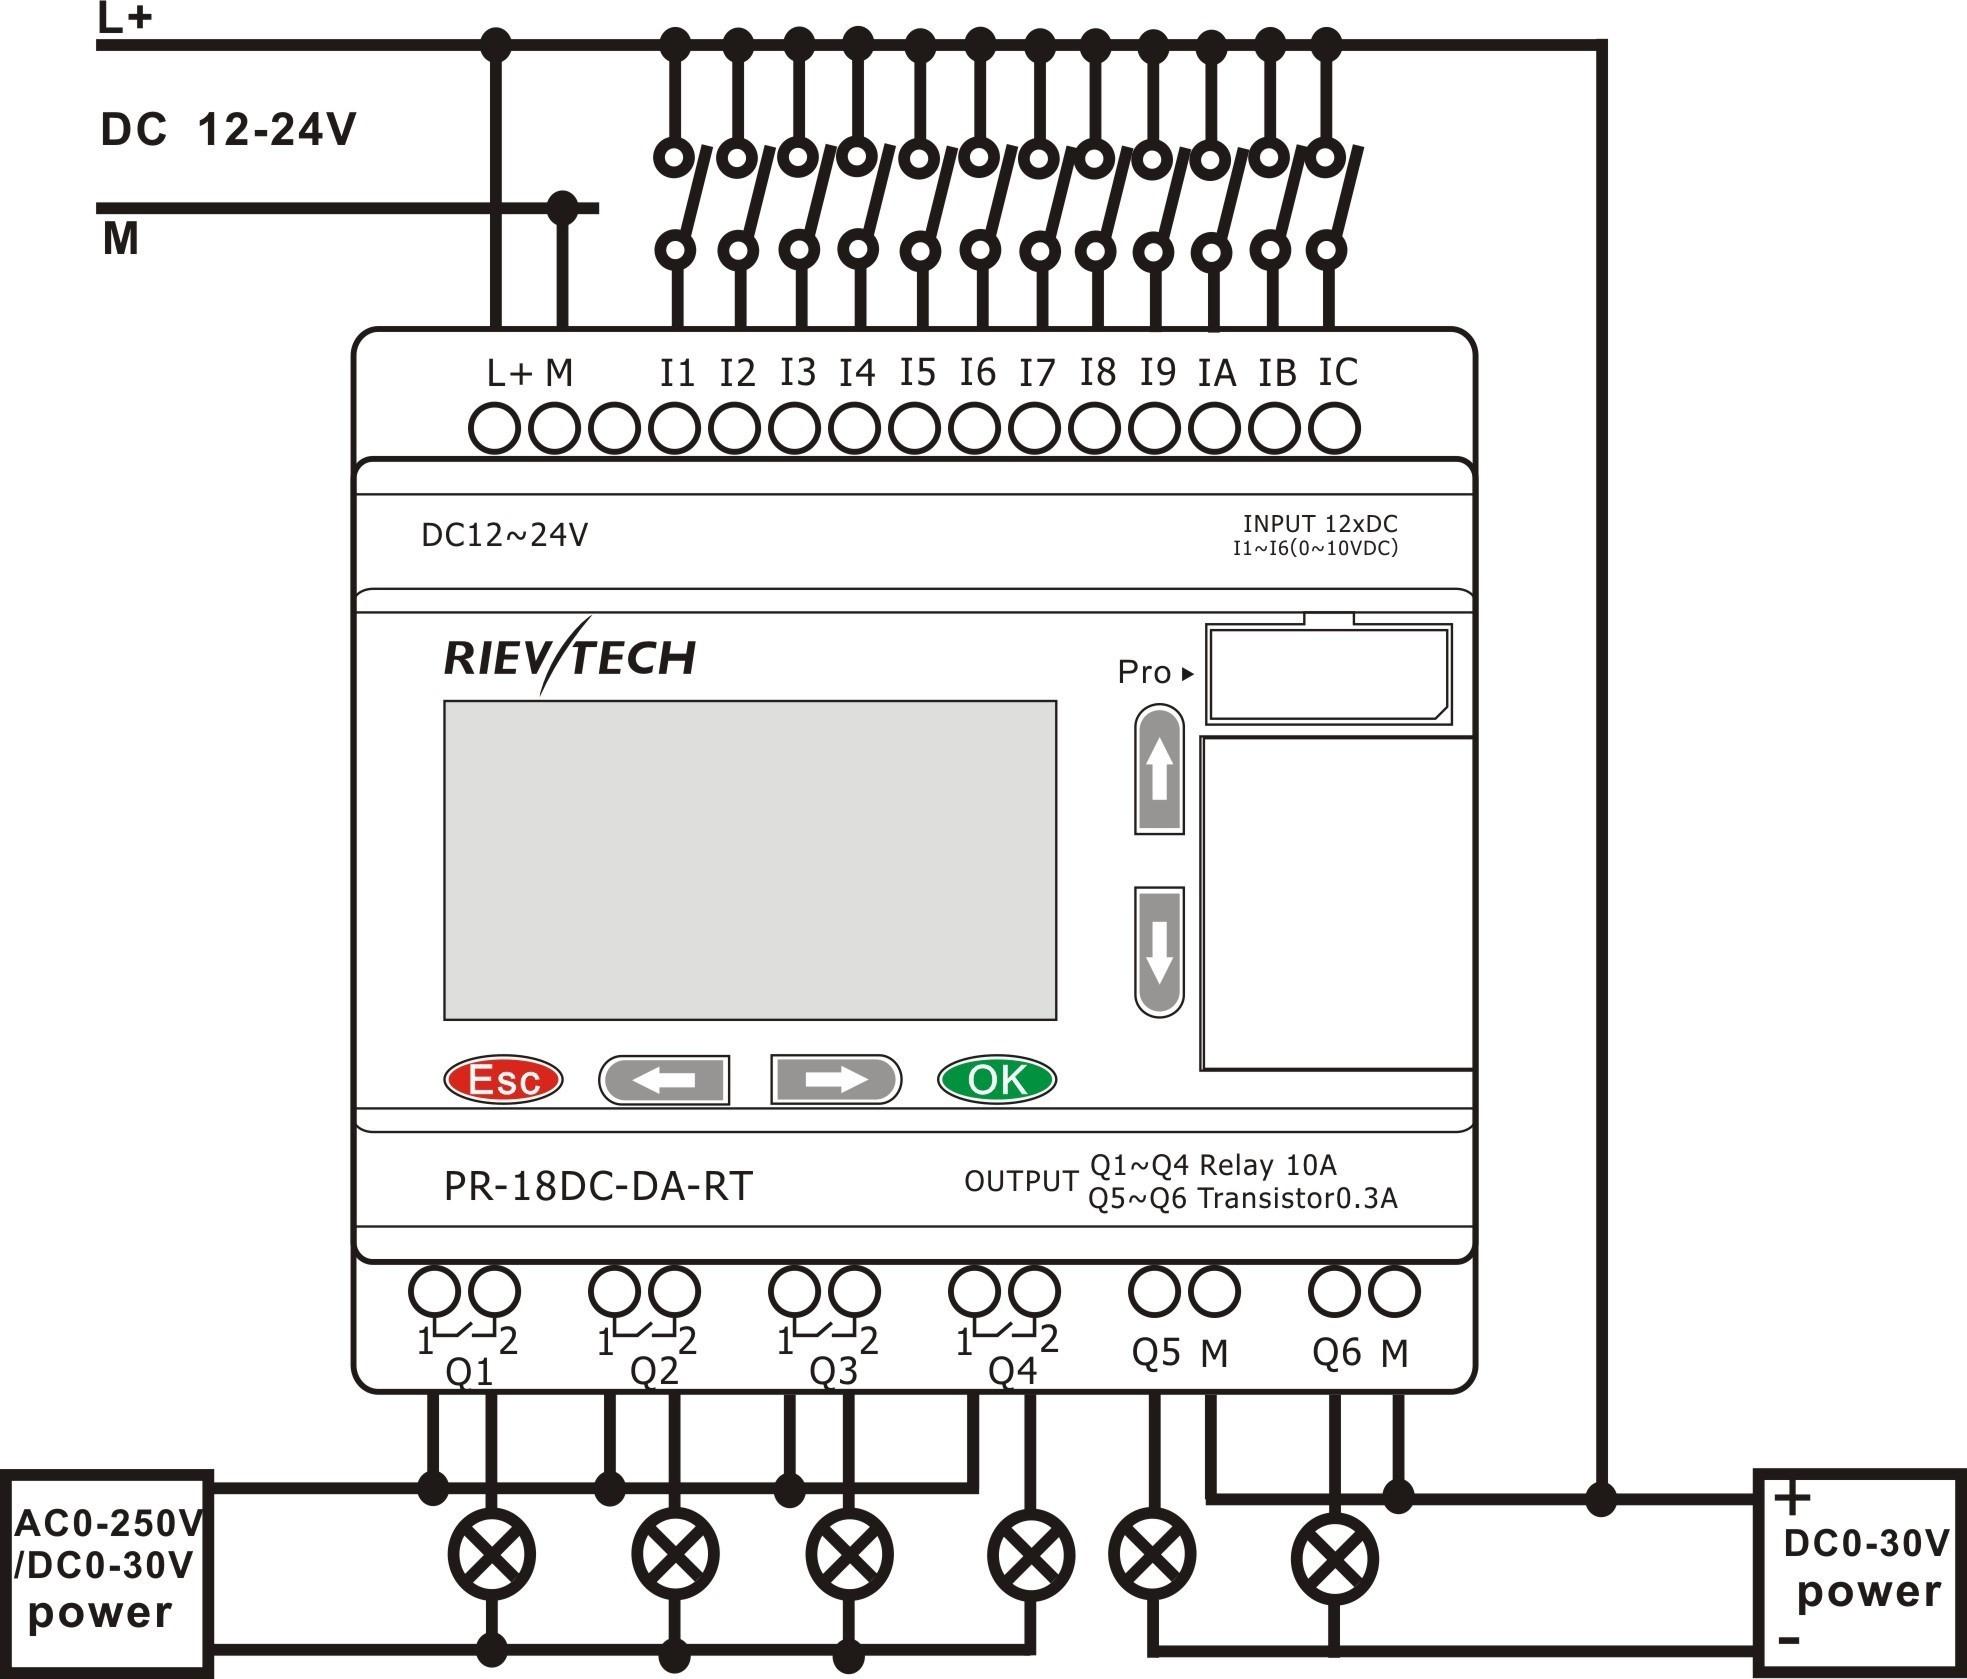 Plc Wiring Diagram Guide | Manual E-Books - Plc Wiring Diagram